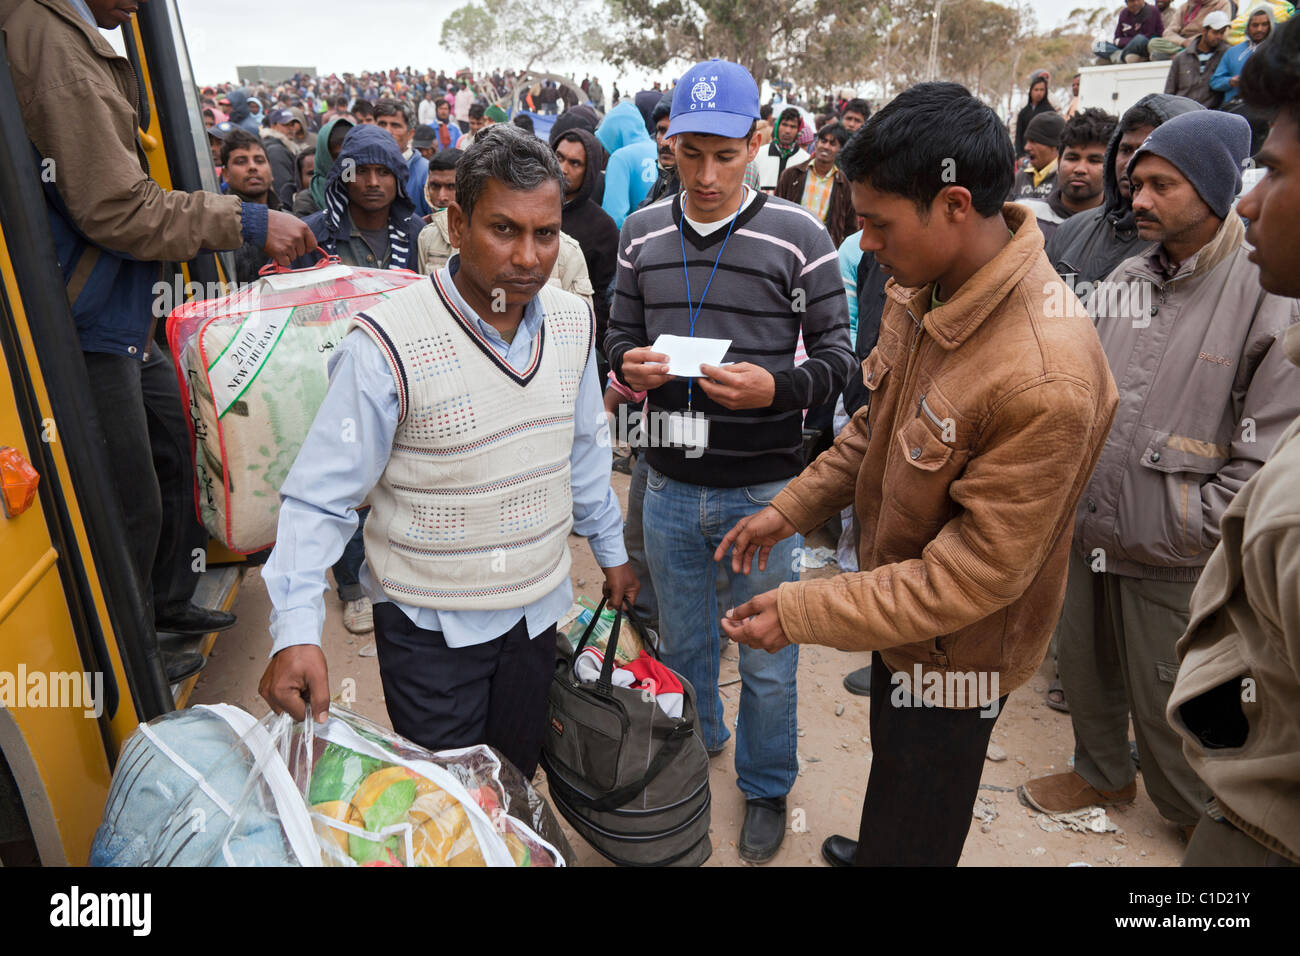 Arrival of new refugees in the Shousha refugee camp, Ben Gardane, Tunisia - Stock Image